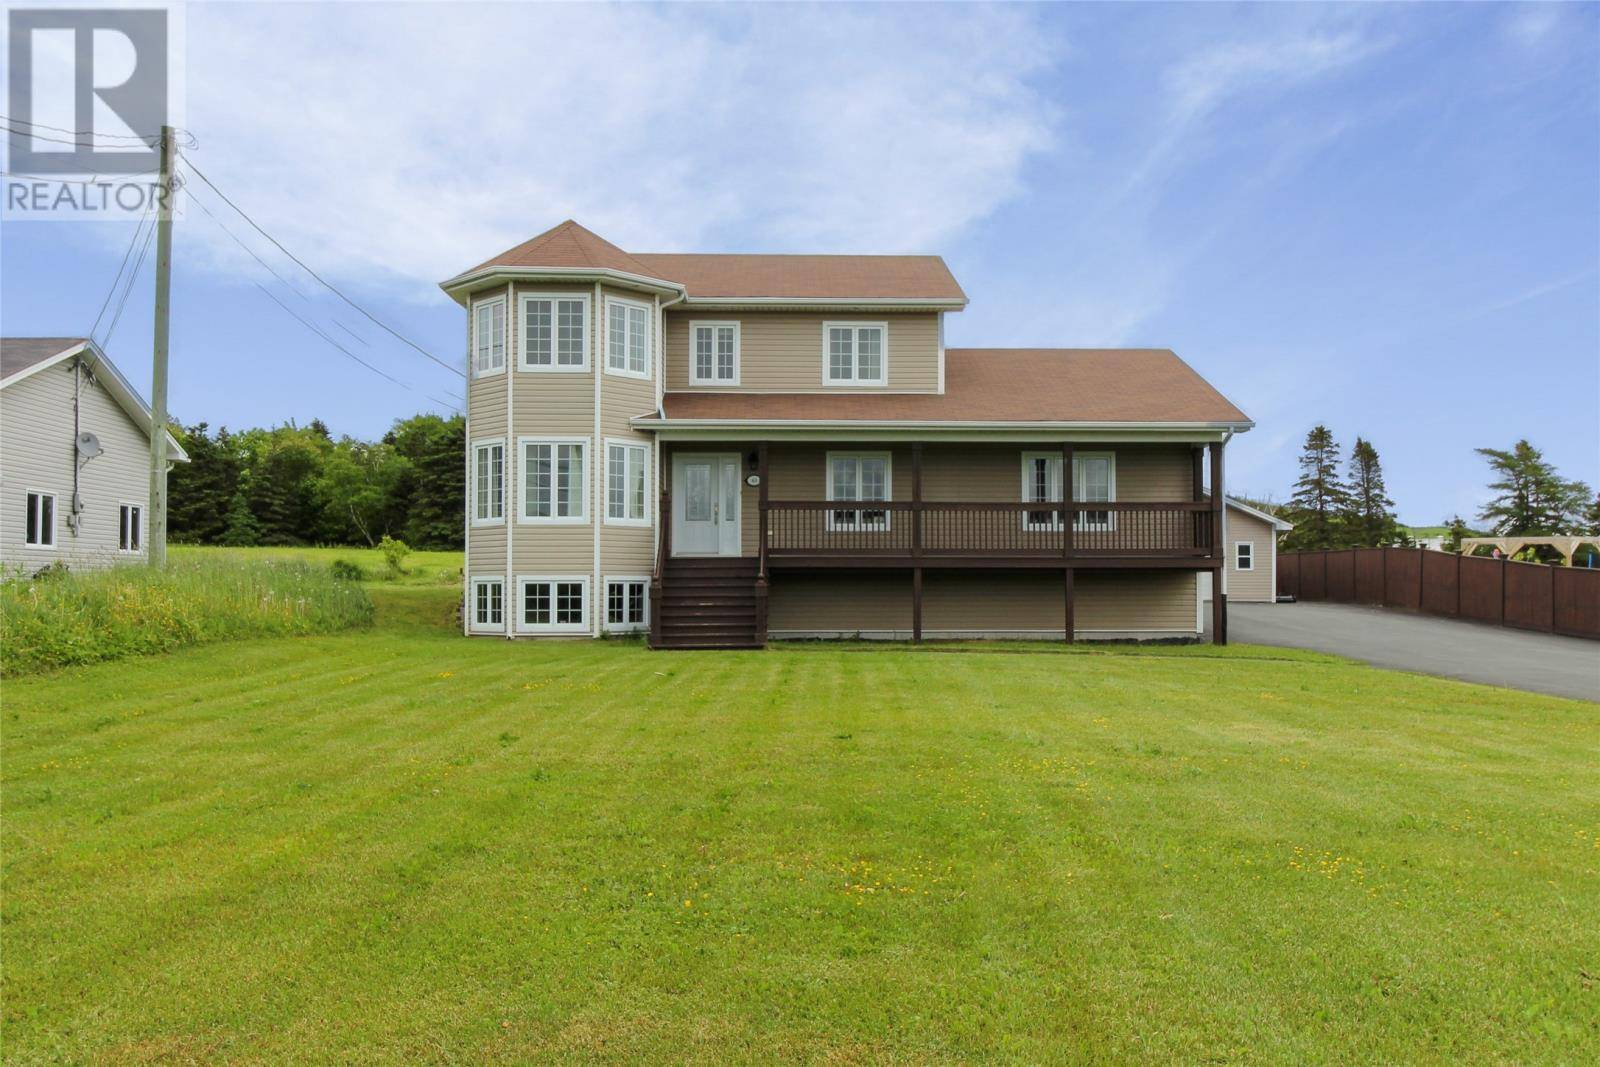 House for sale at 43 Hennesseys Line St. John's Newfoundland - MLS: 1198789